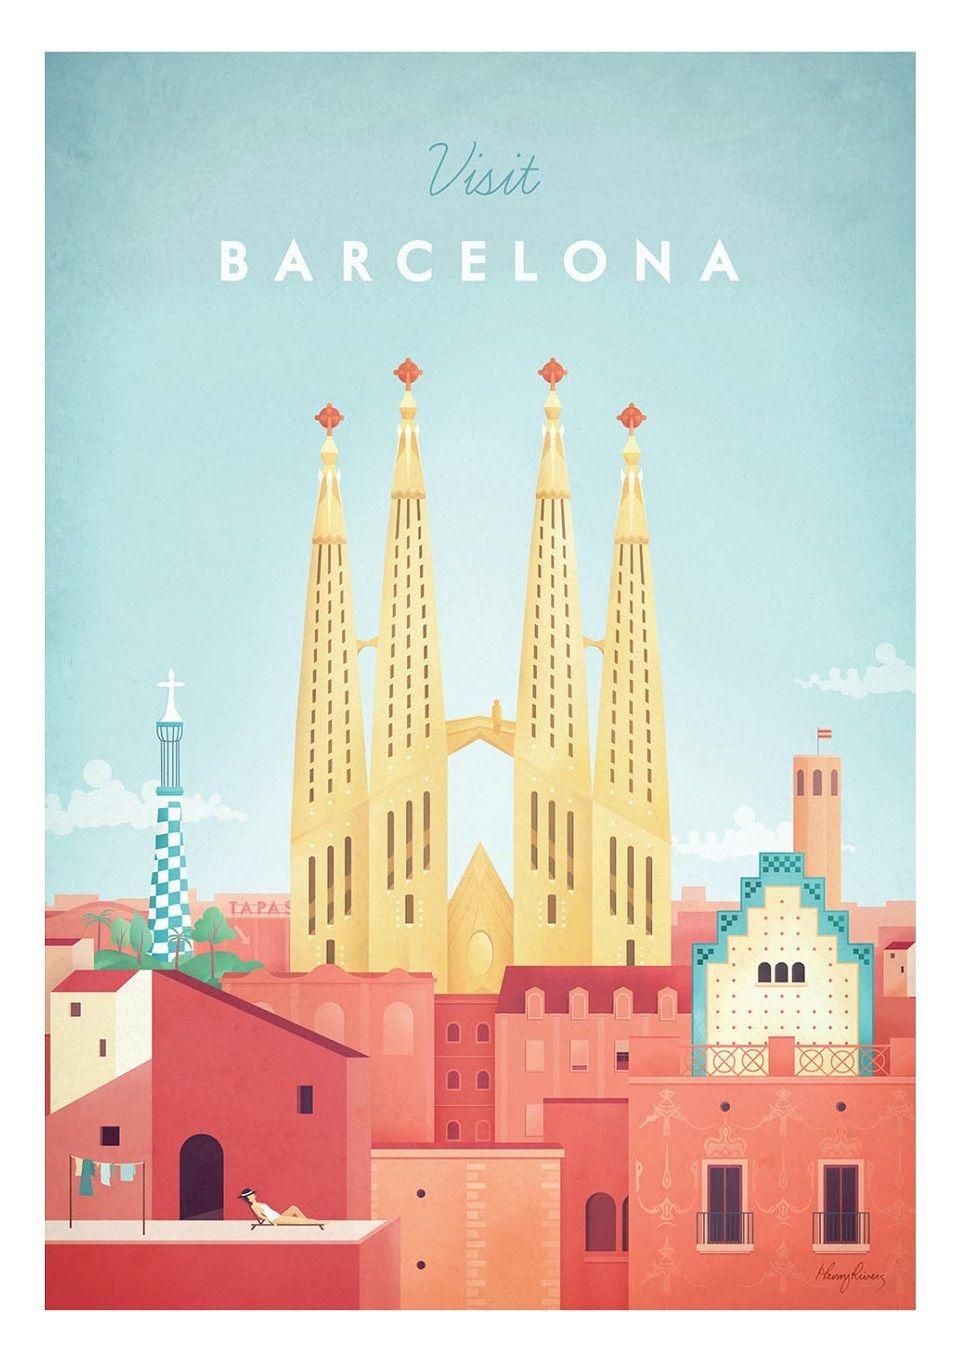 Sagrada Familia Barcelona Spanien Sagrada Familia Barcelona Spain Basilica I Temp With Images Barcelona Travel Poster Travel Posters Retro Travel Poster